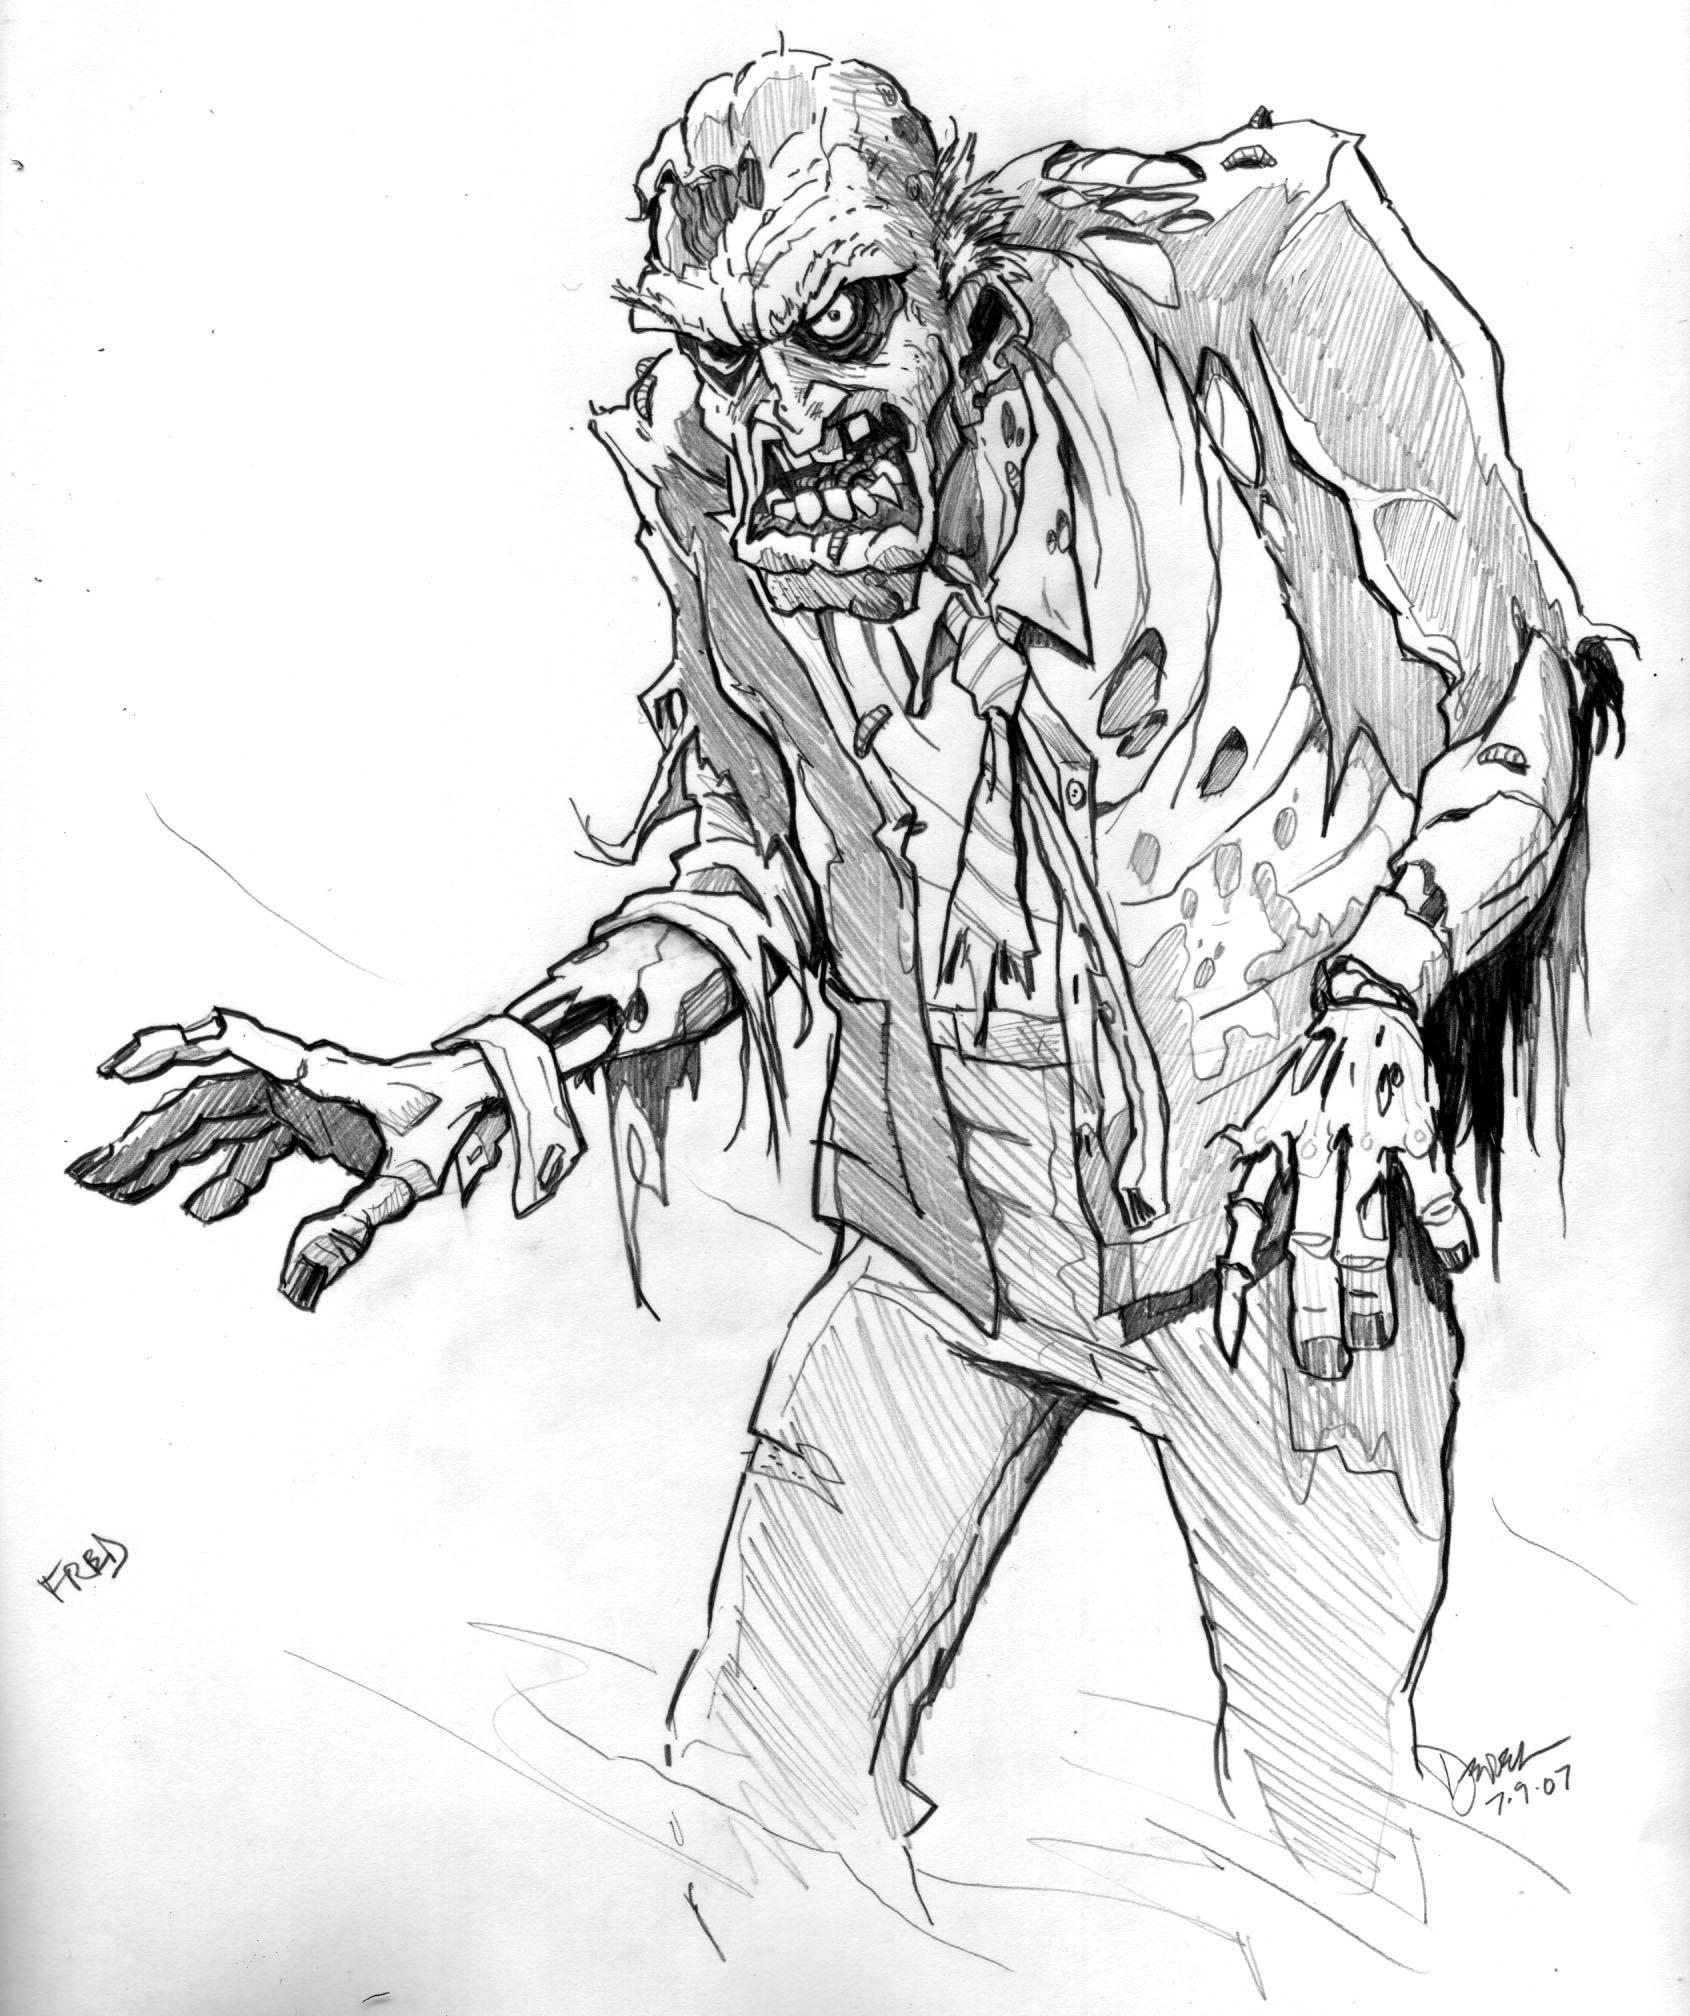 варенки зомби апокалипсис рисунки карандашом количества лифтов для